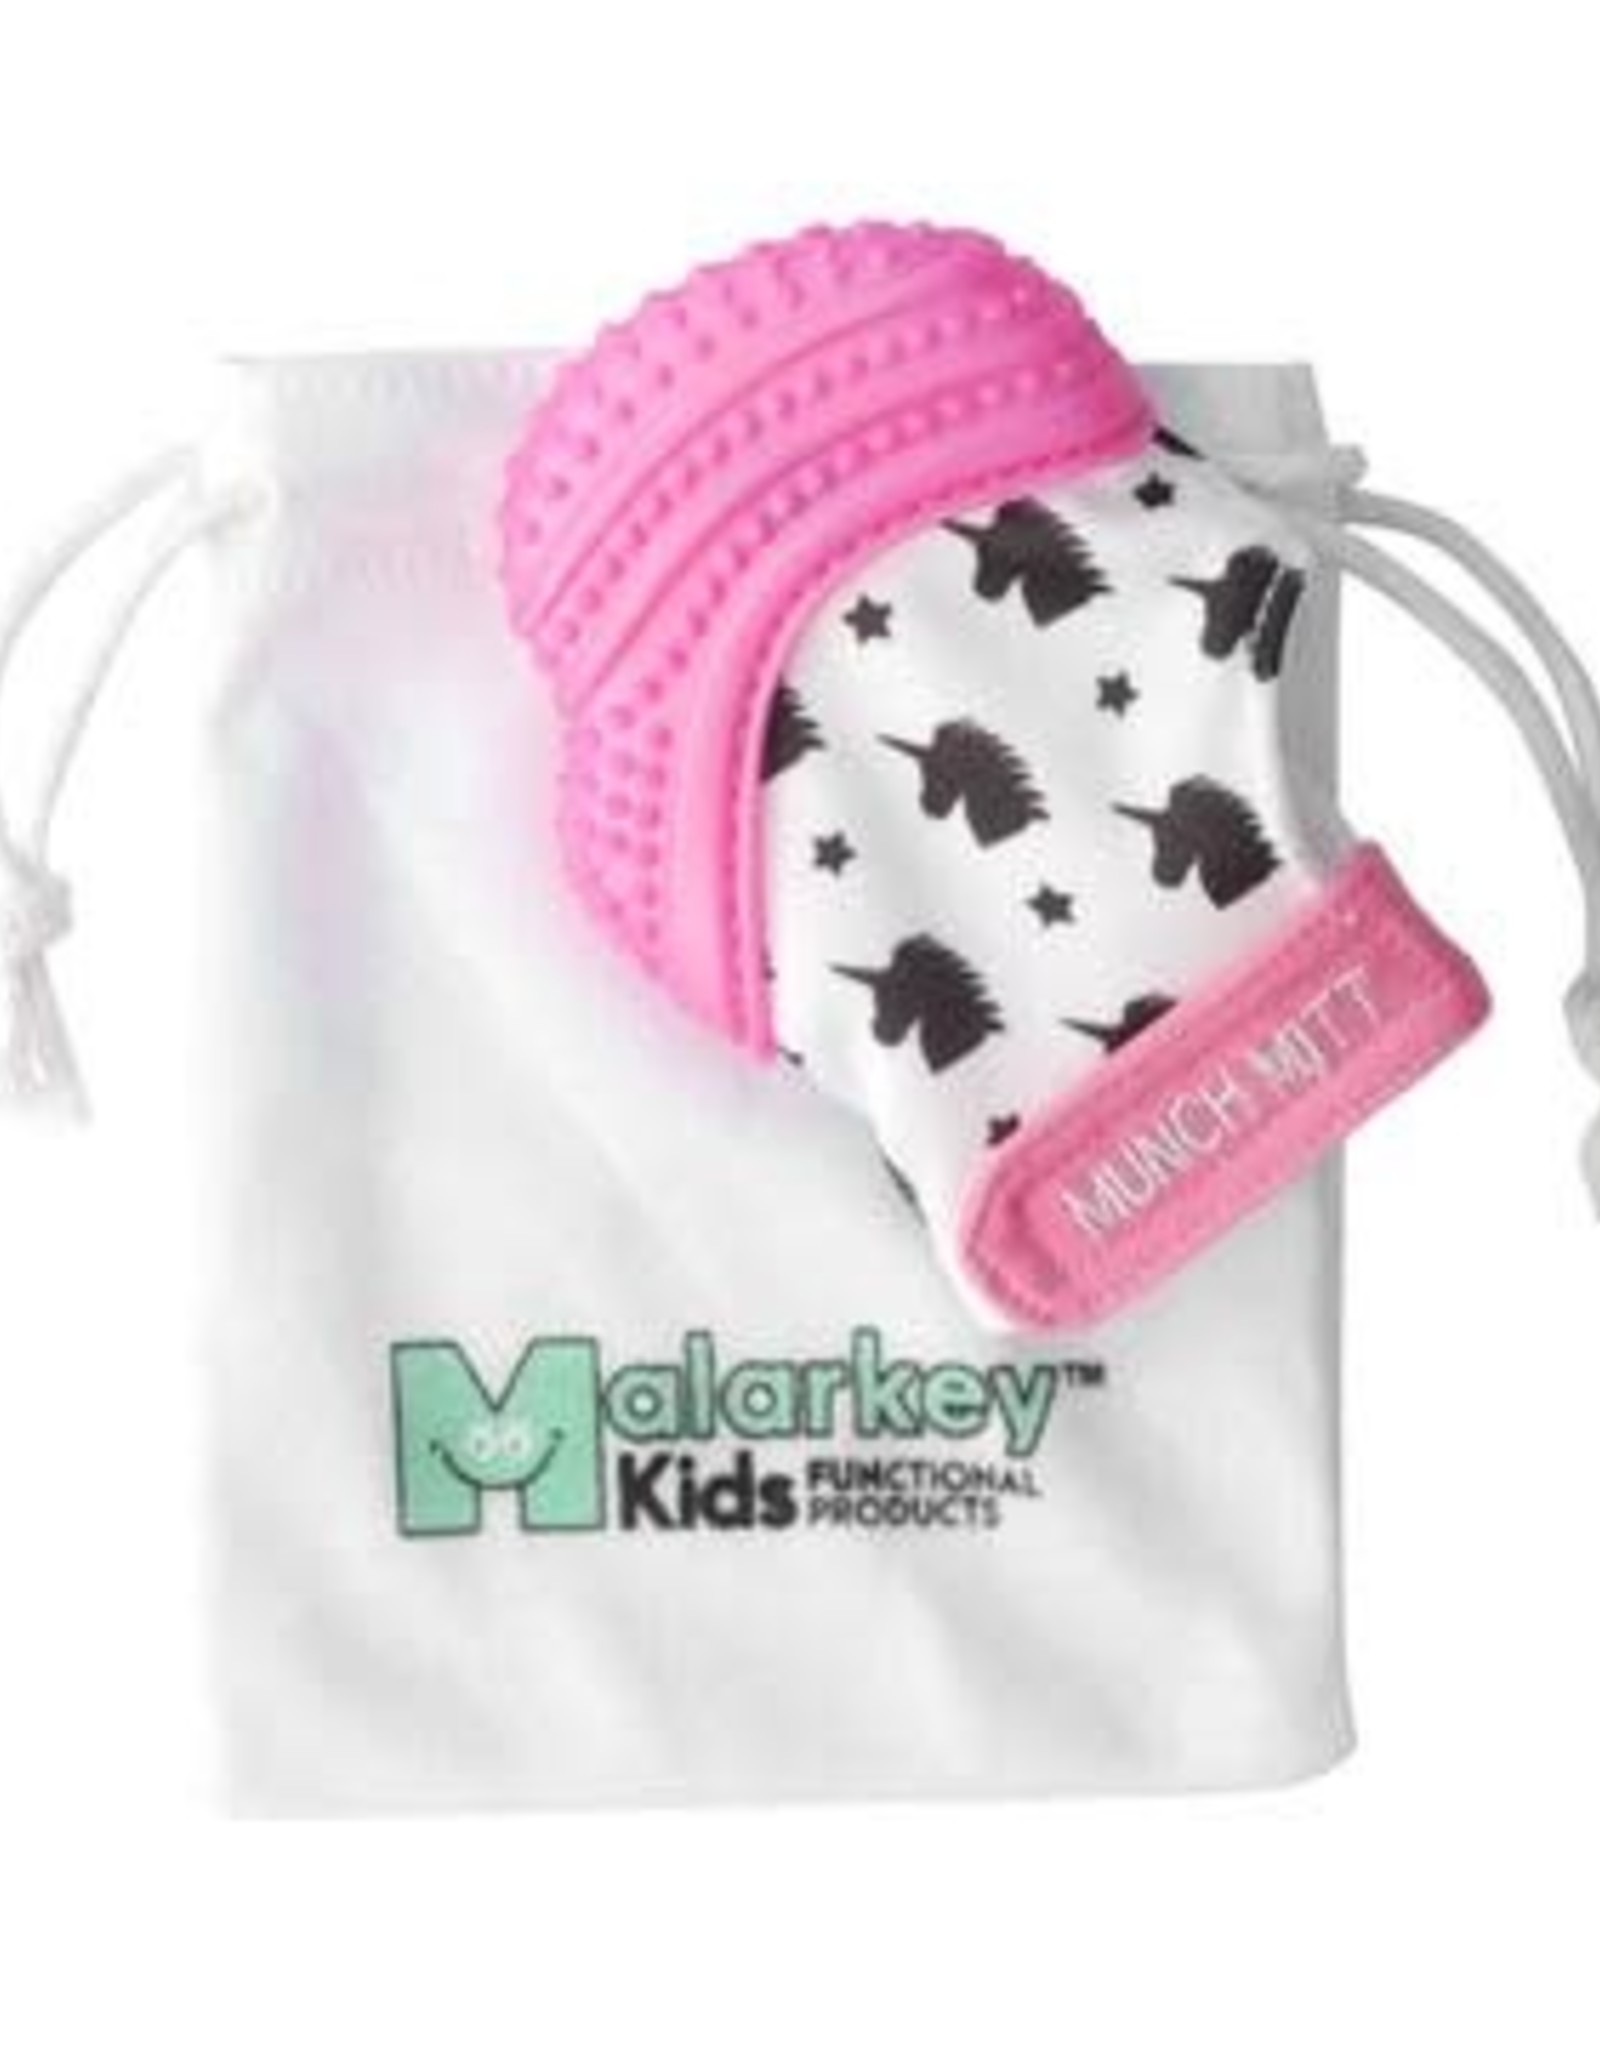 Malarkey Kids Munch Mitt in Pink/Unicorn